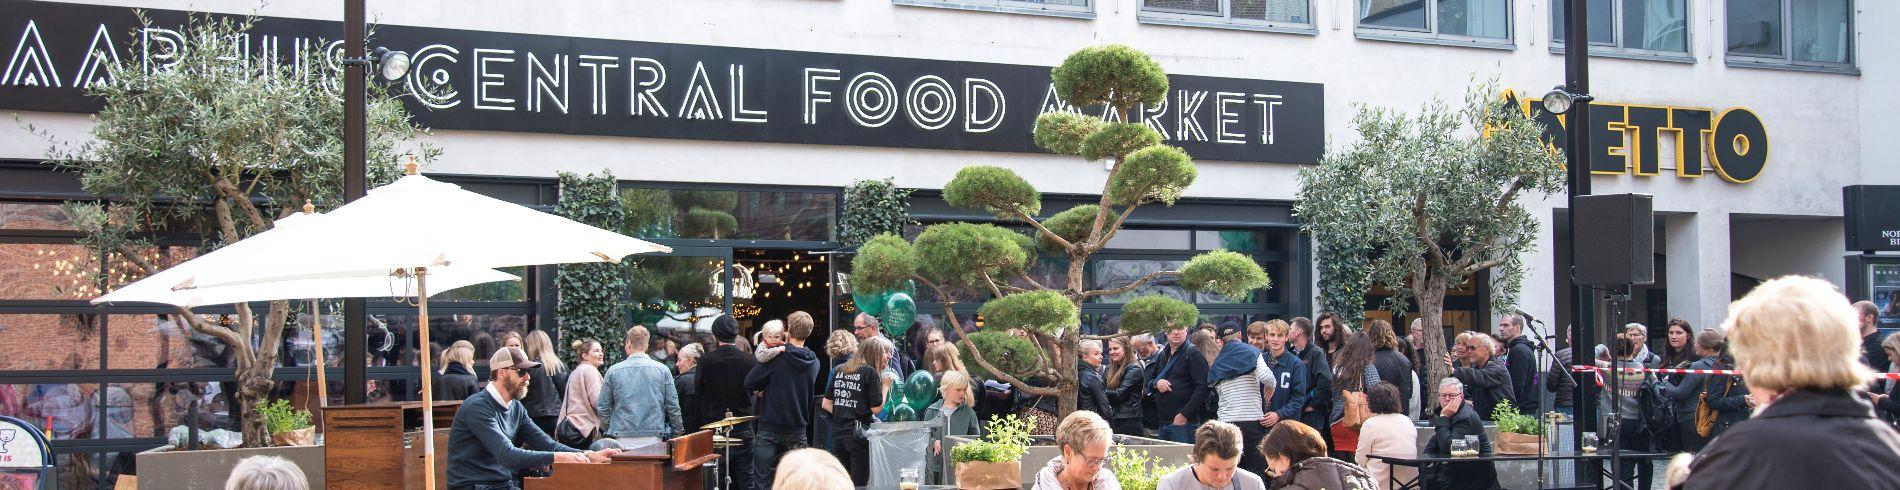 Aarhus Central Food Market cover image